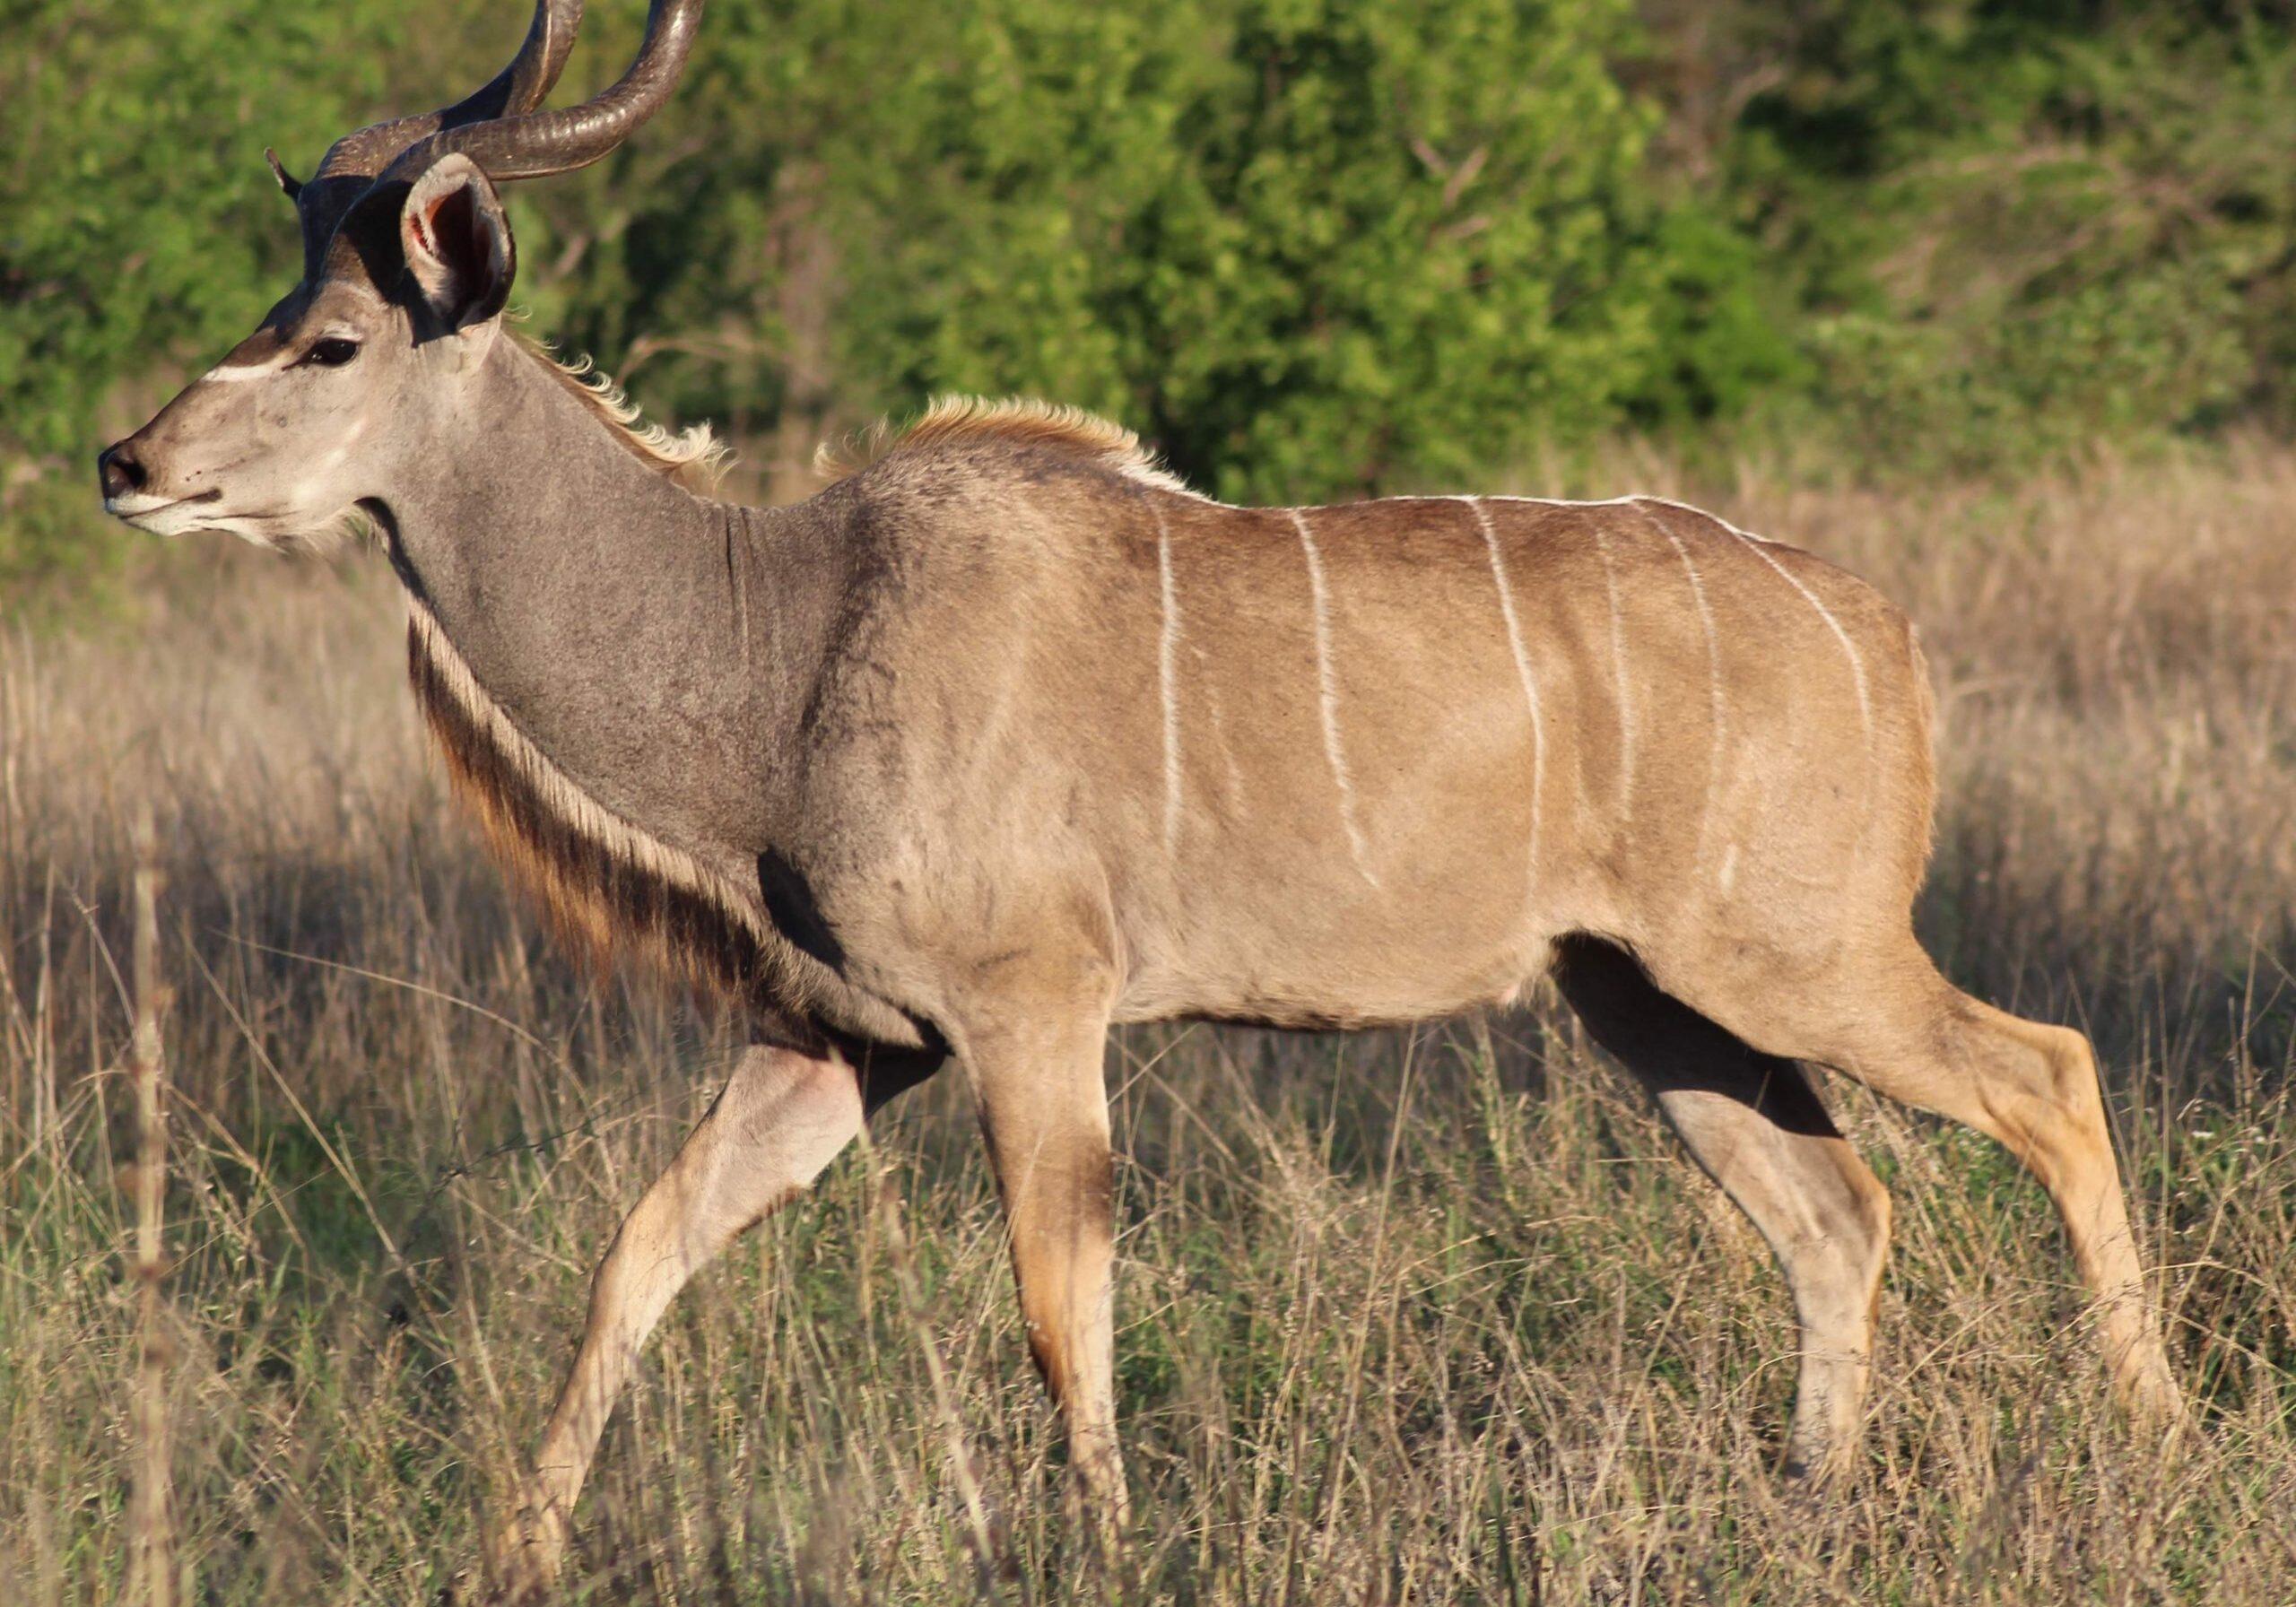 Greater Kudu Xongi-tings Xongi-pedia (Mammal - Even-toed Ungulate)